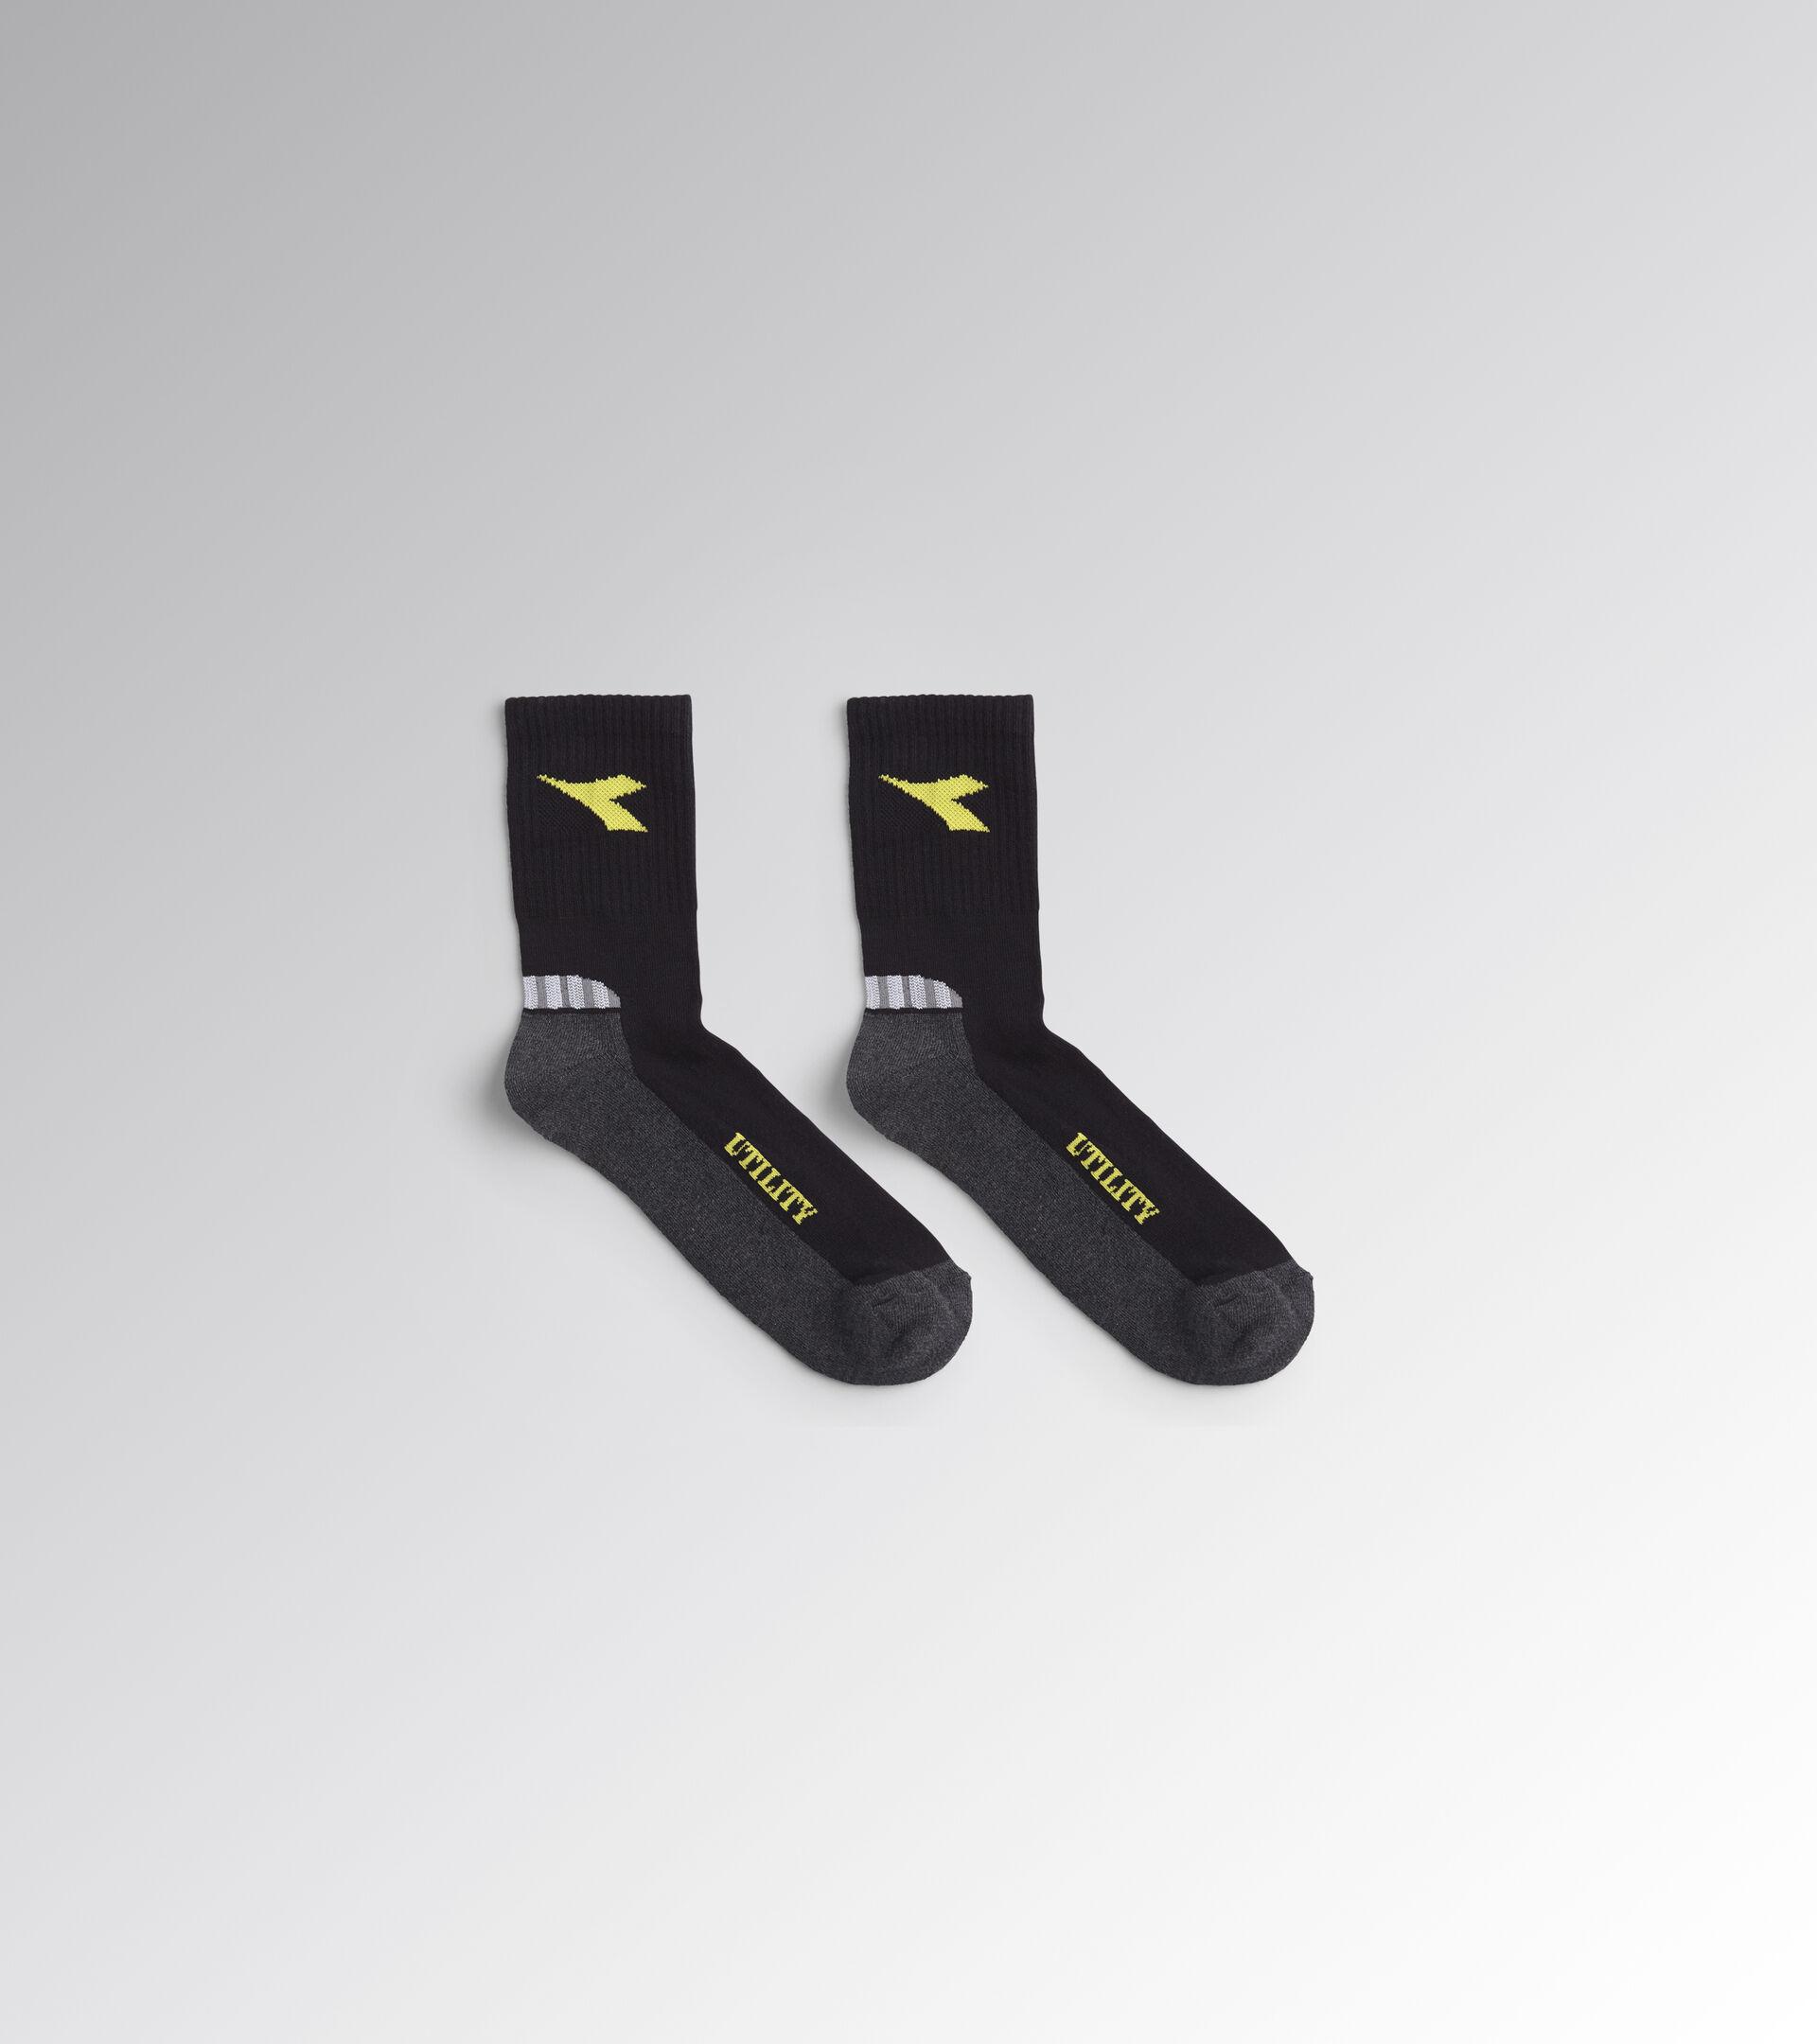 Accessories Utility UNISEX COTTON SUMMER SOCKS BLACK/DARK GULL GREY Utility